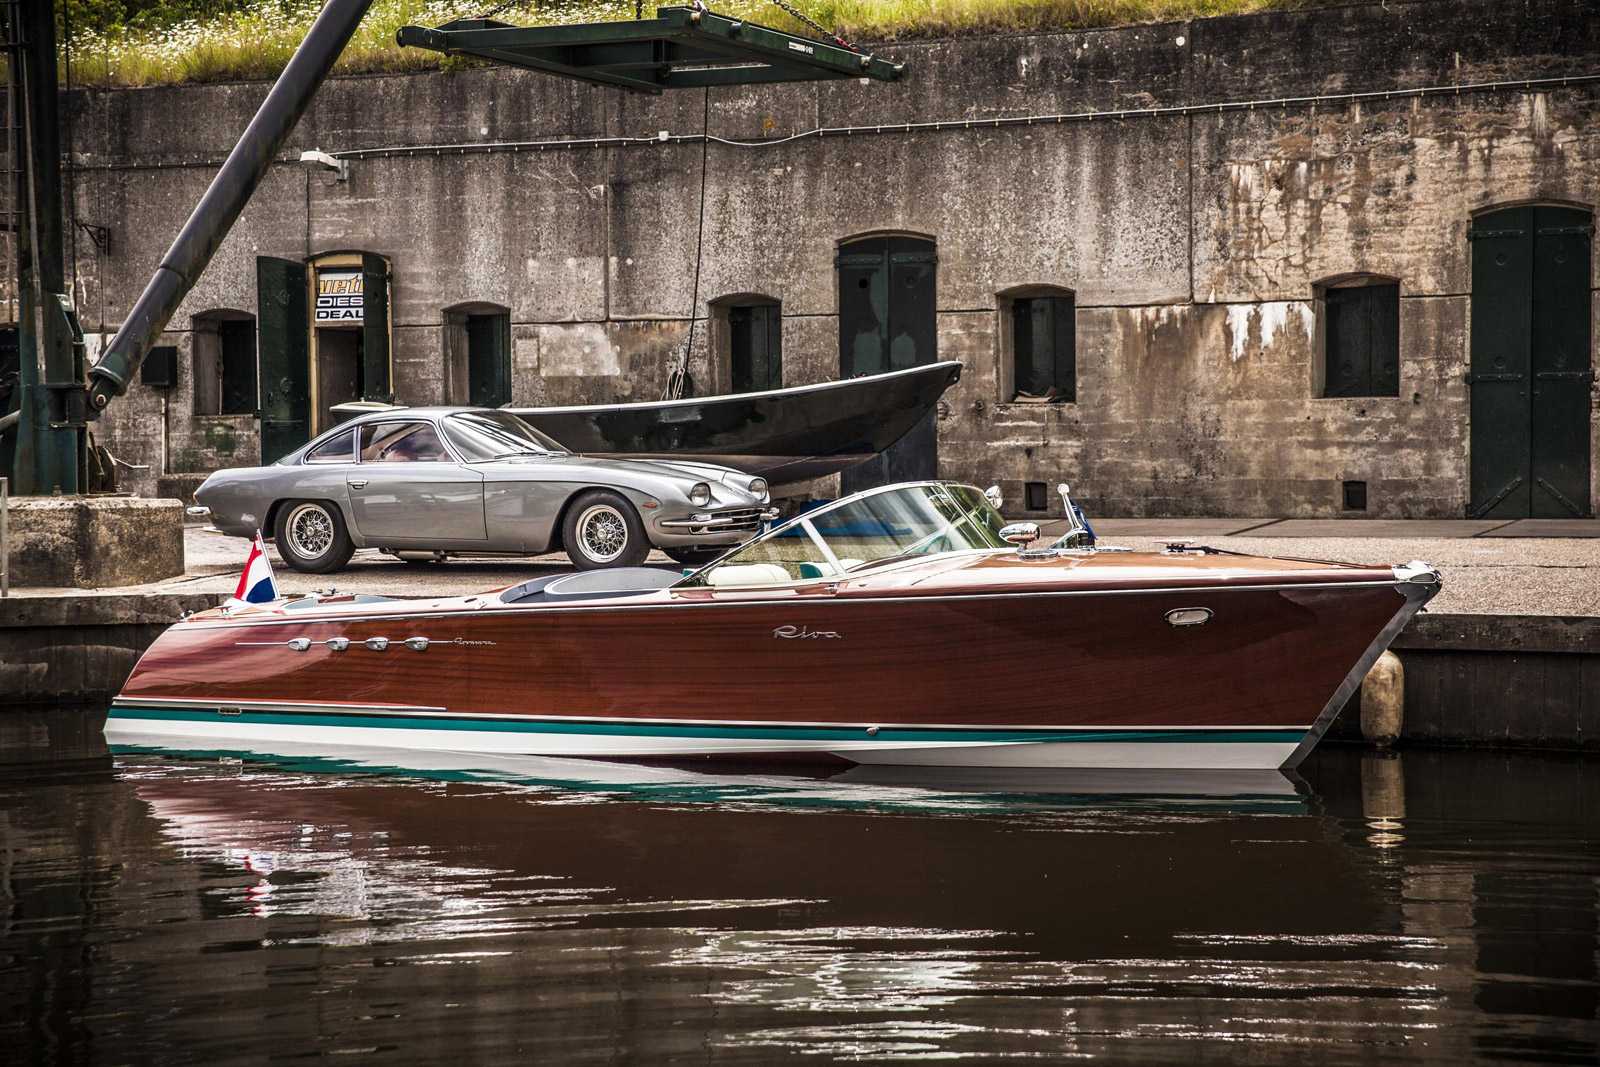 Ferruccio Lamborghini S Speedboat Restored